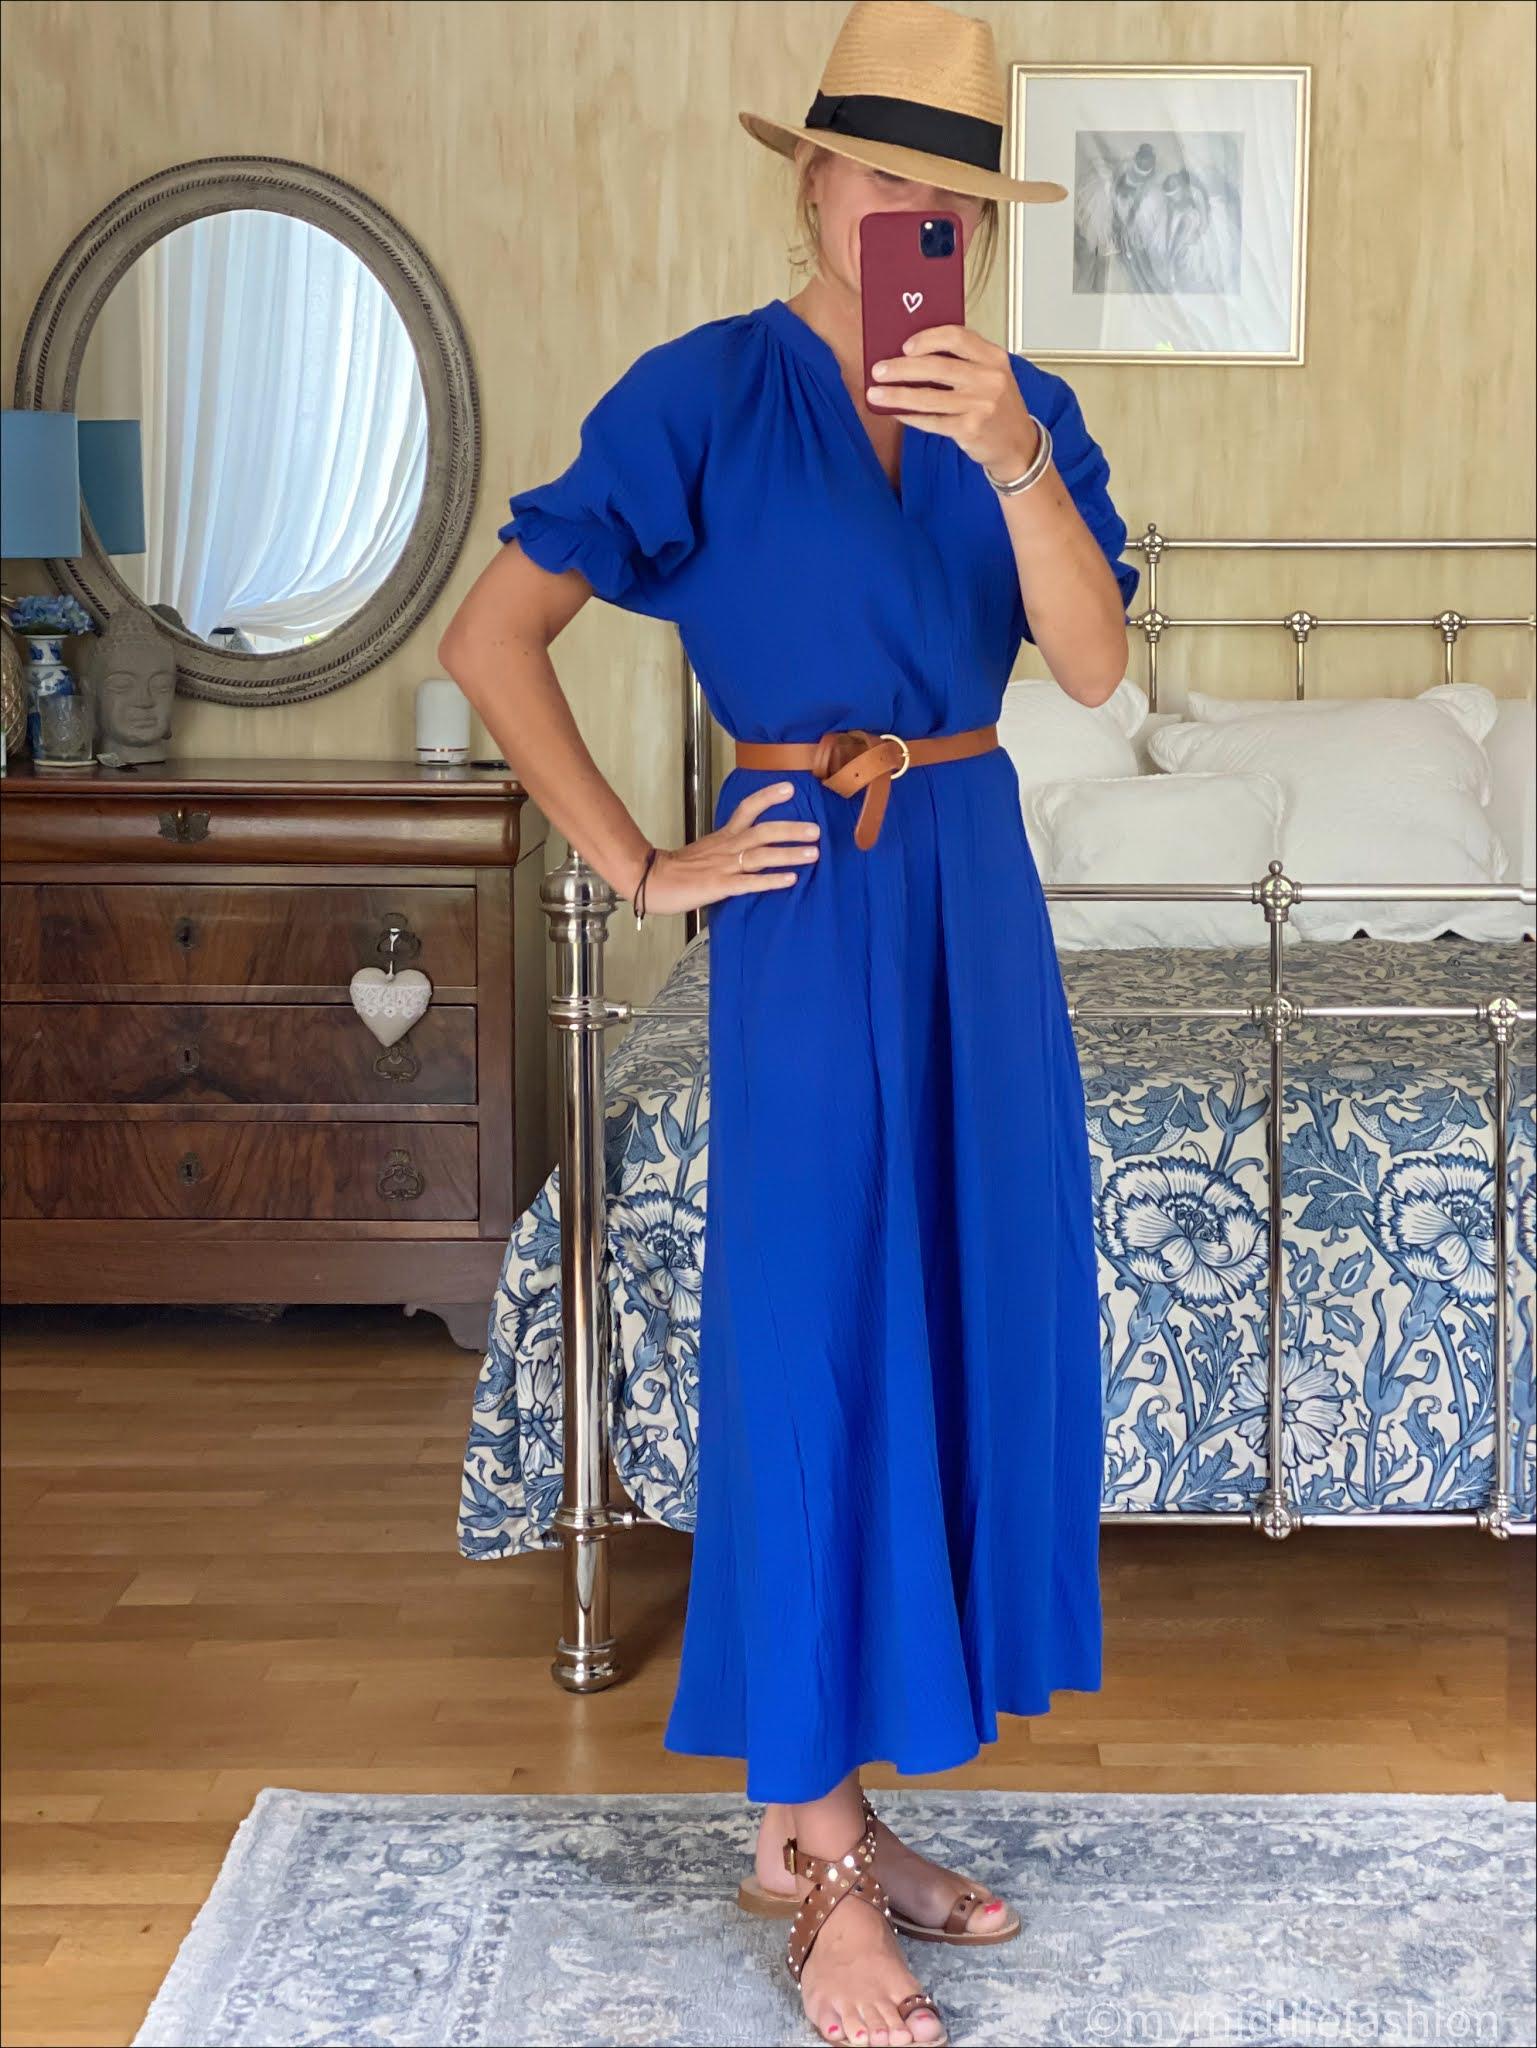 my midlife fashion, scarlet roos maxi dress, H&M Panama hat, Massimo Dutti leather belt, basalt studded sandals